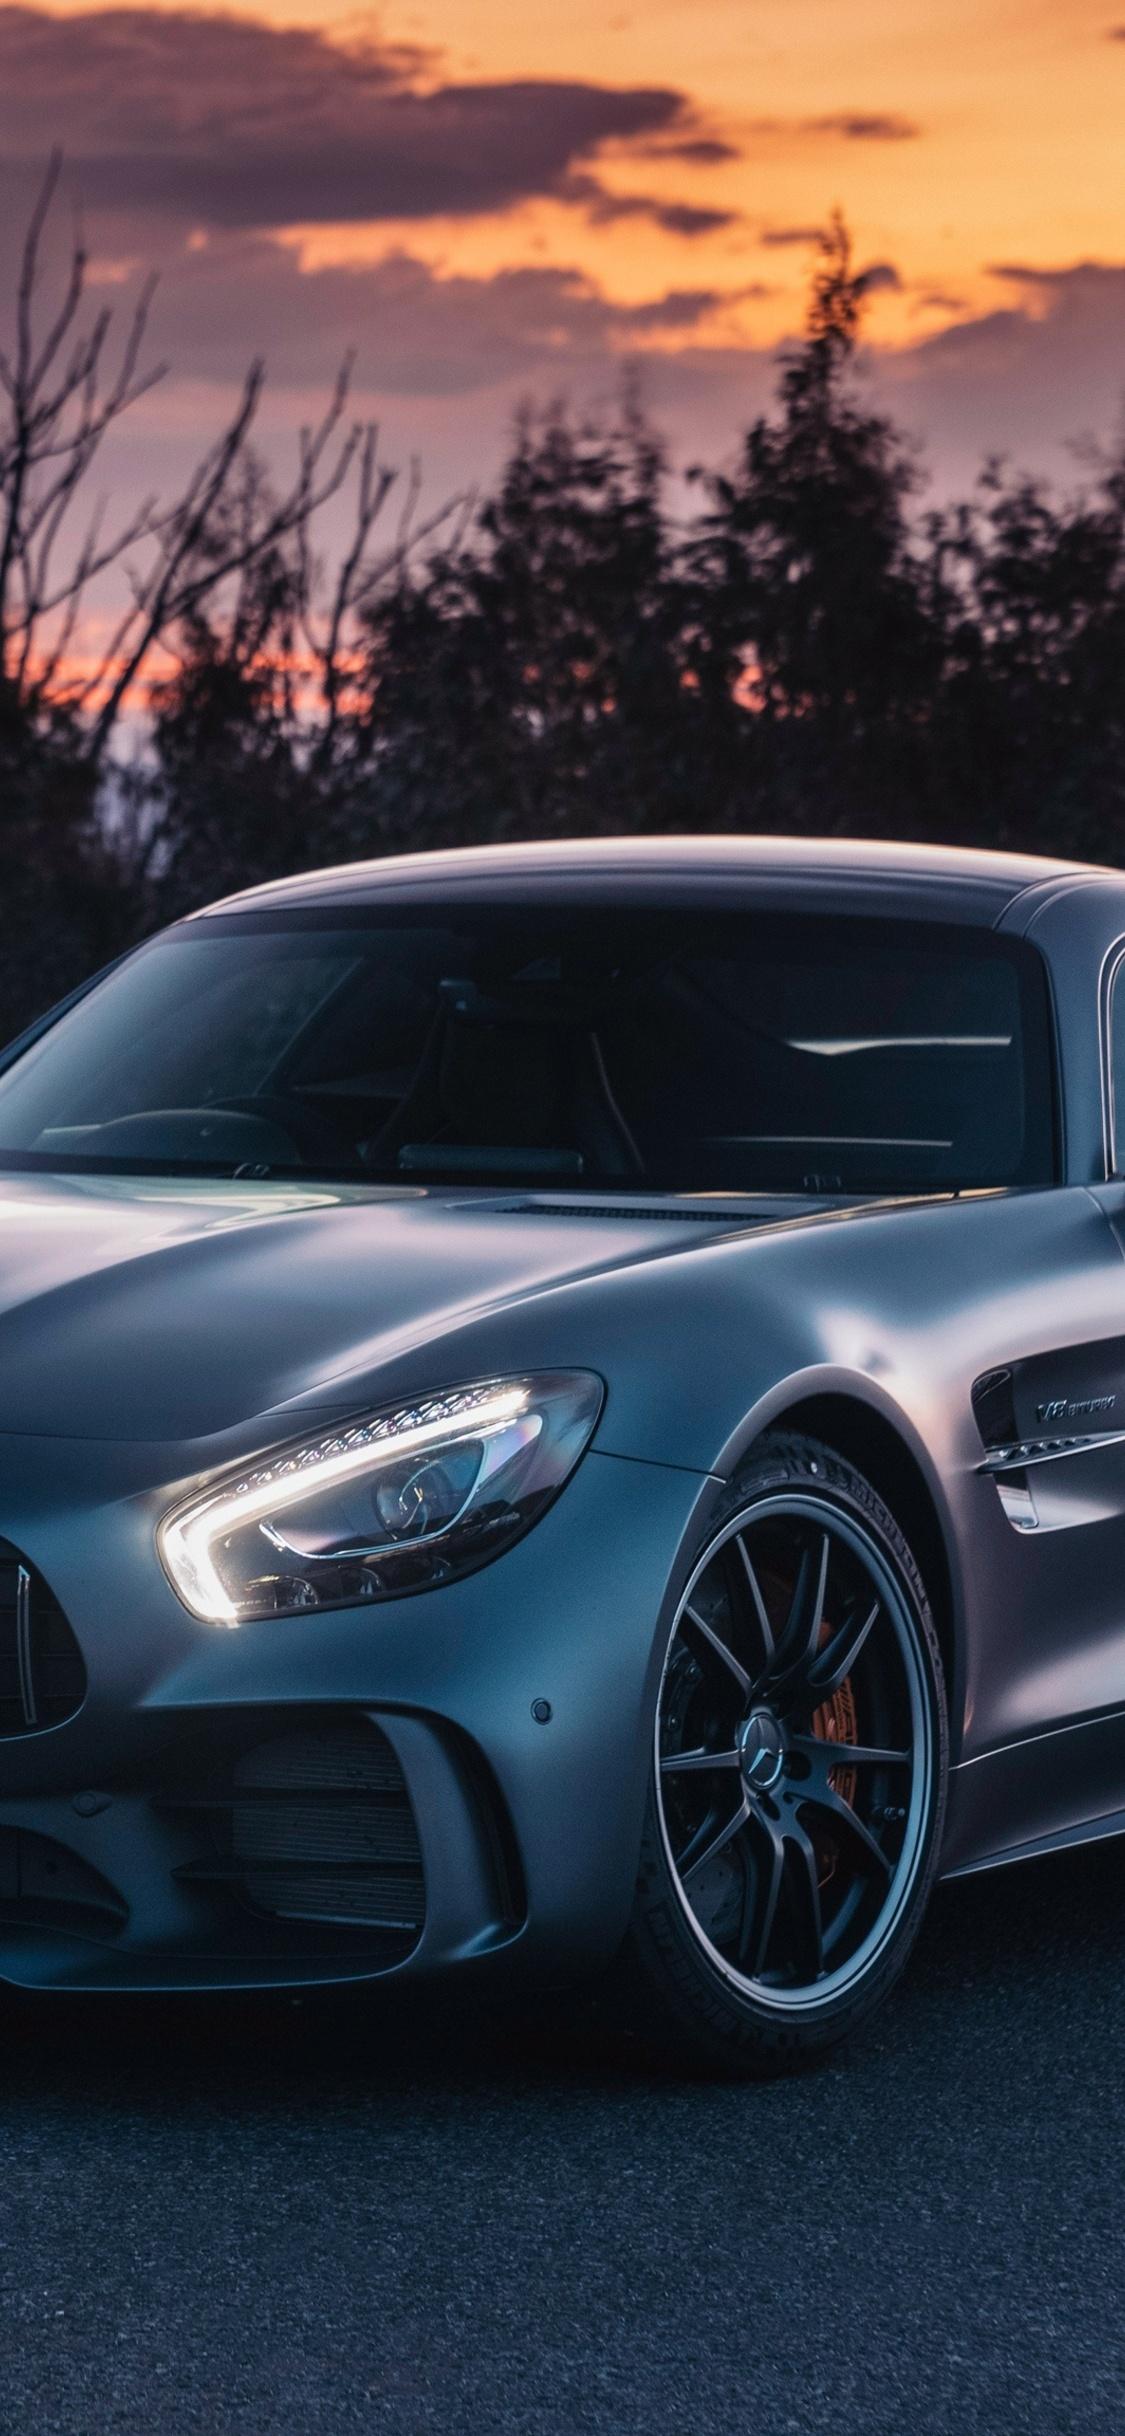 1125x2436 Amg Gtr Mercedes Benz 2018 Iphone Xs Iphone 10